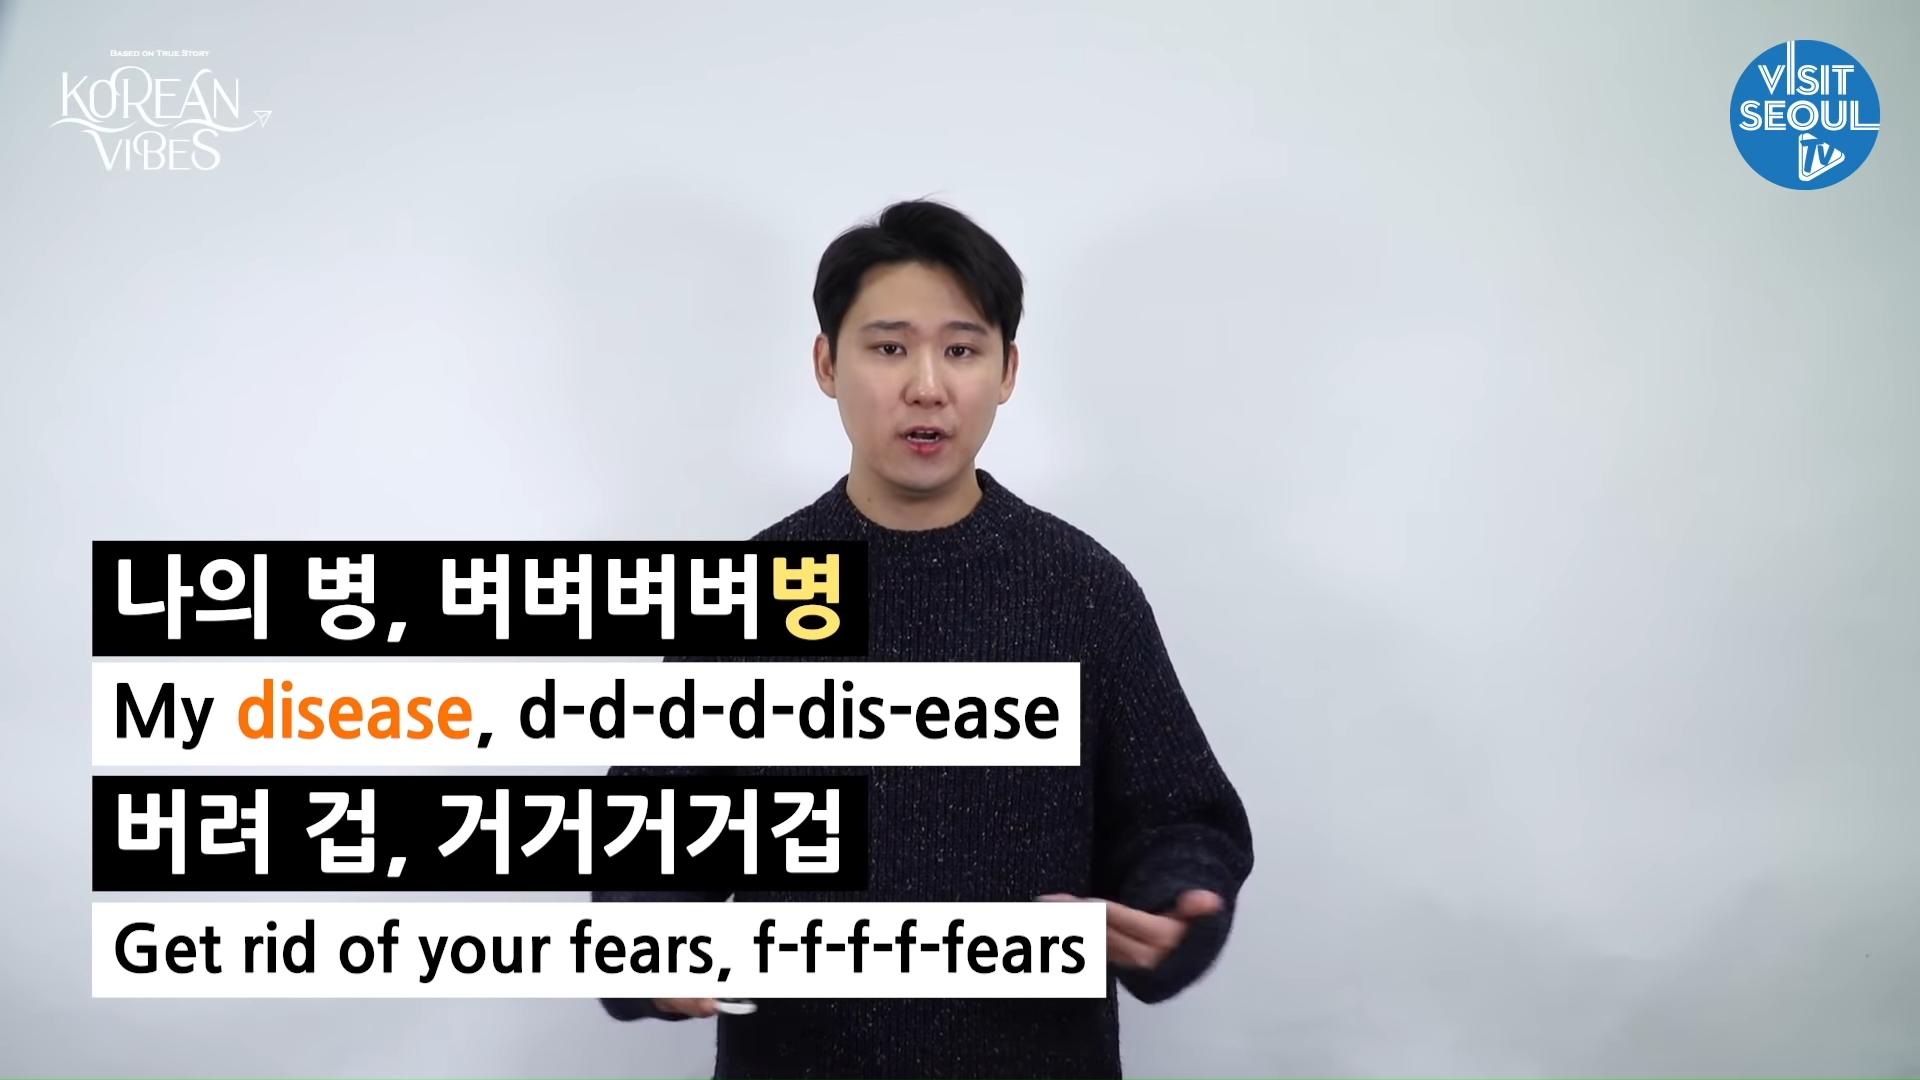 BTS - Dis-ease Explained by a Korean 4-57 screenshot